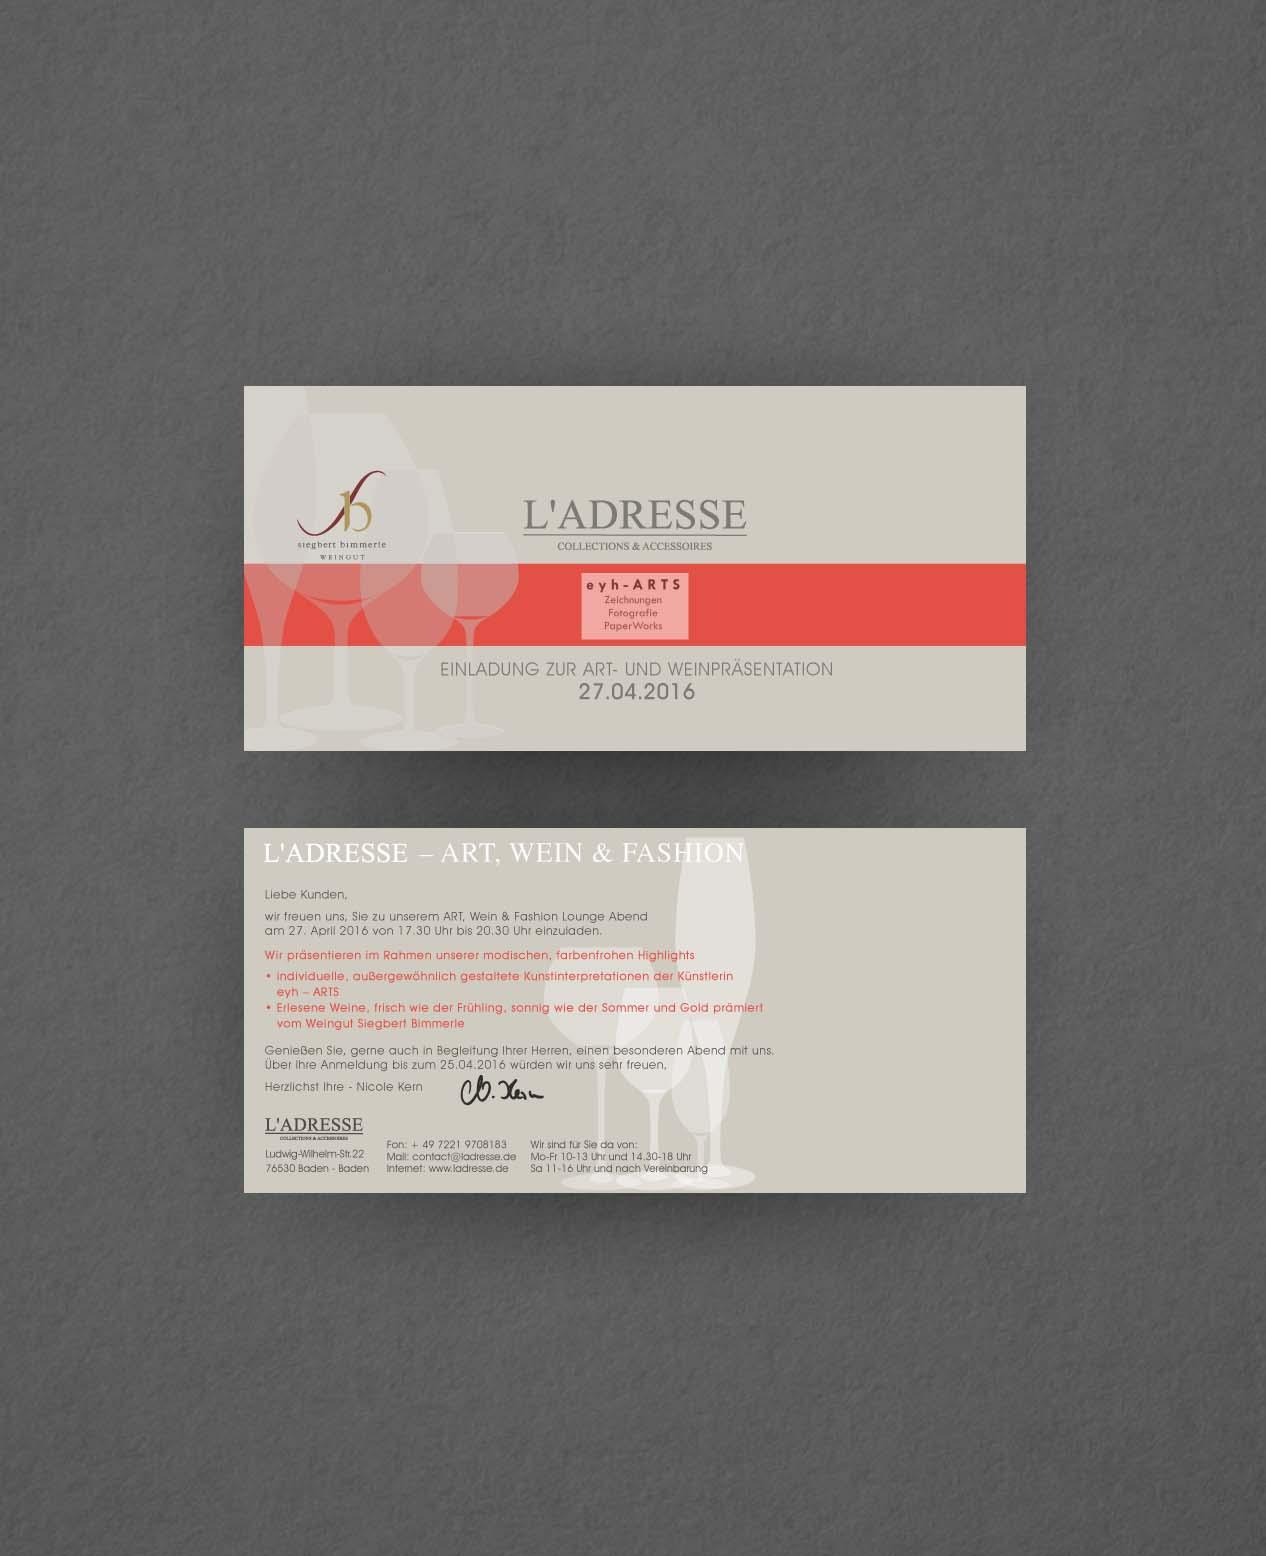 Referenzen | references: Postkarte | postcard